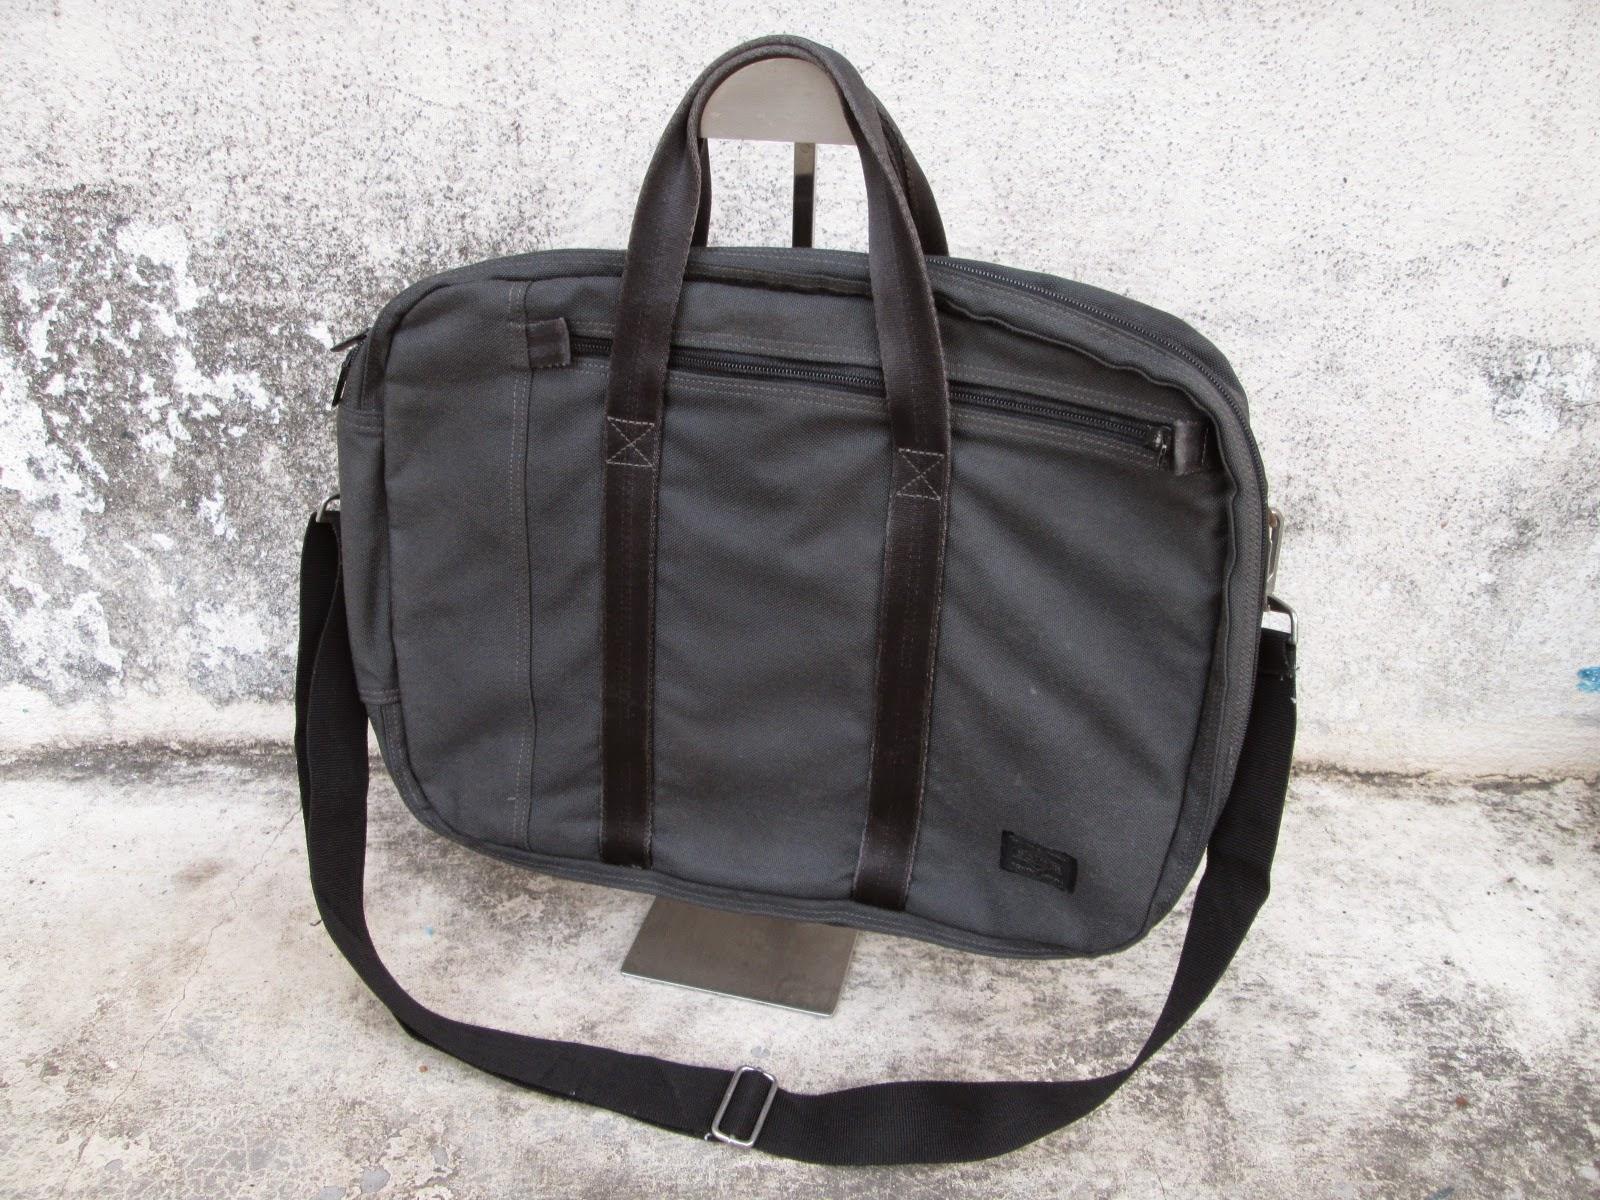 D0rayakeebag Porter Cordura 3way Bag Bagpack Tote